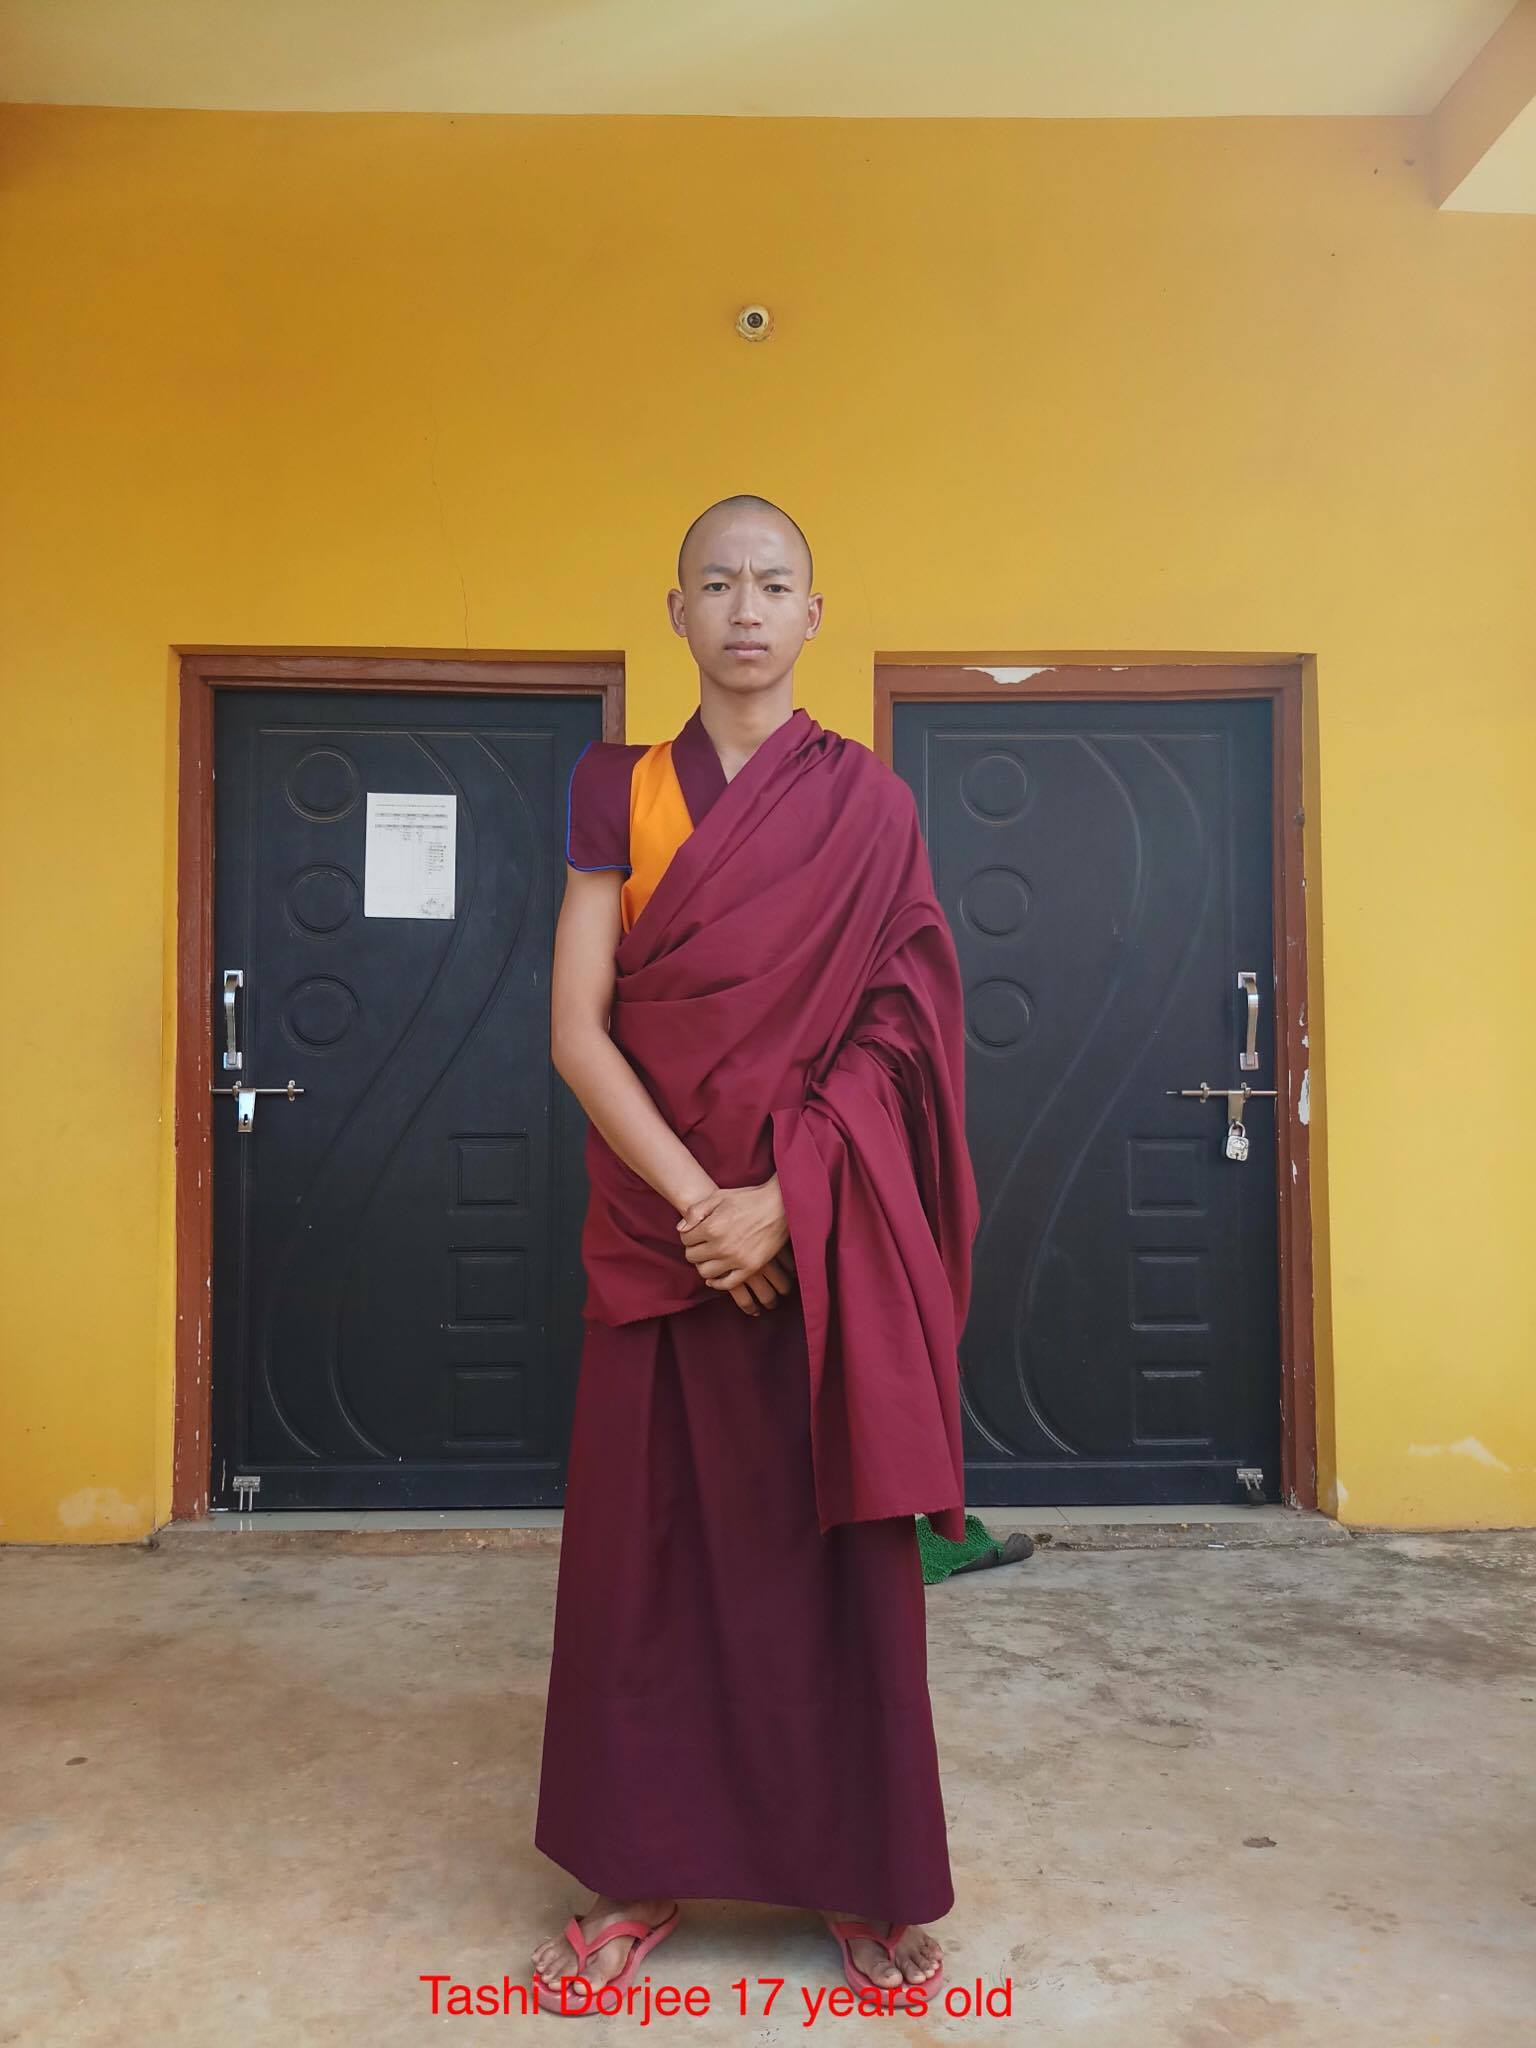 Monk_Tashi_Dorjee_17yrs_old.jpg